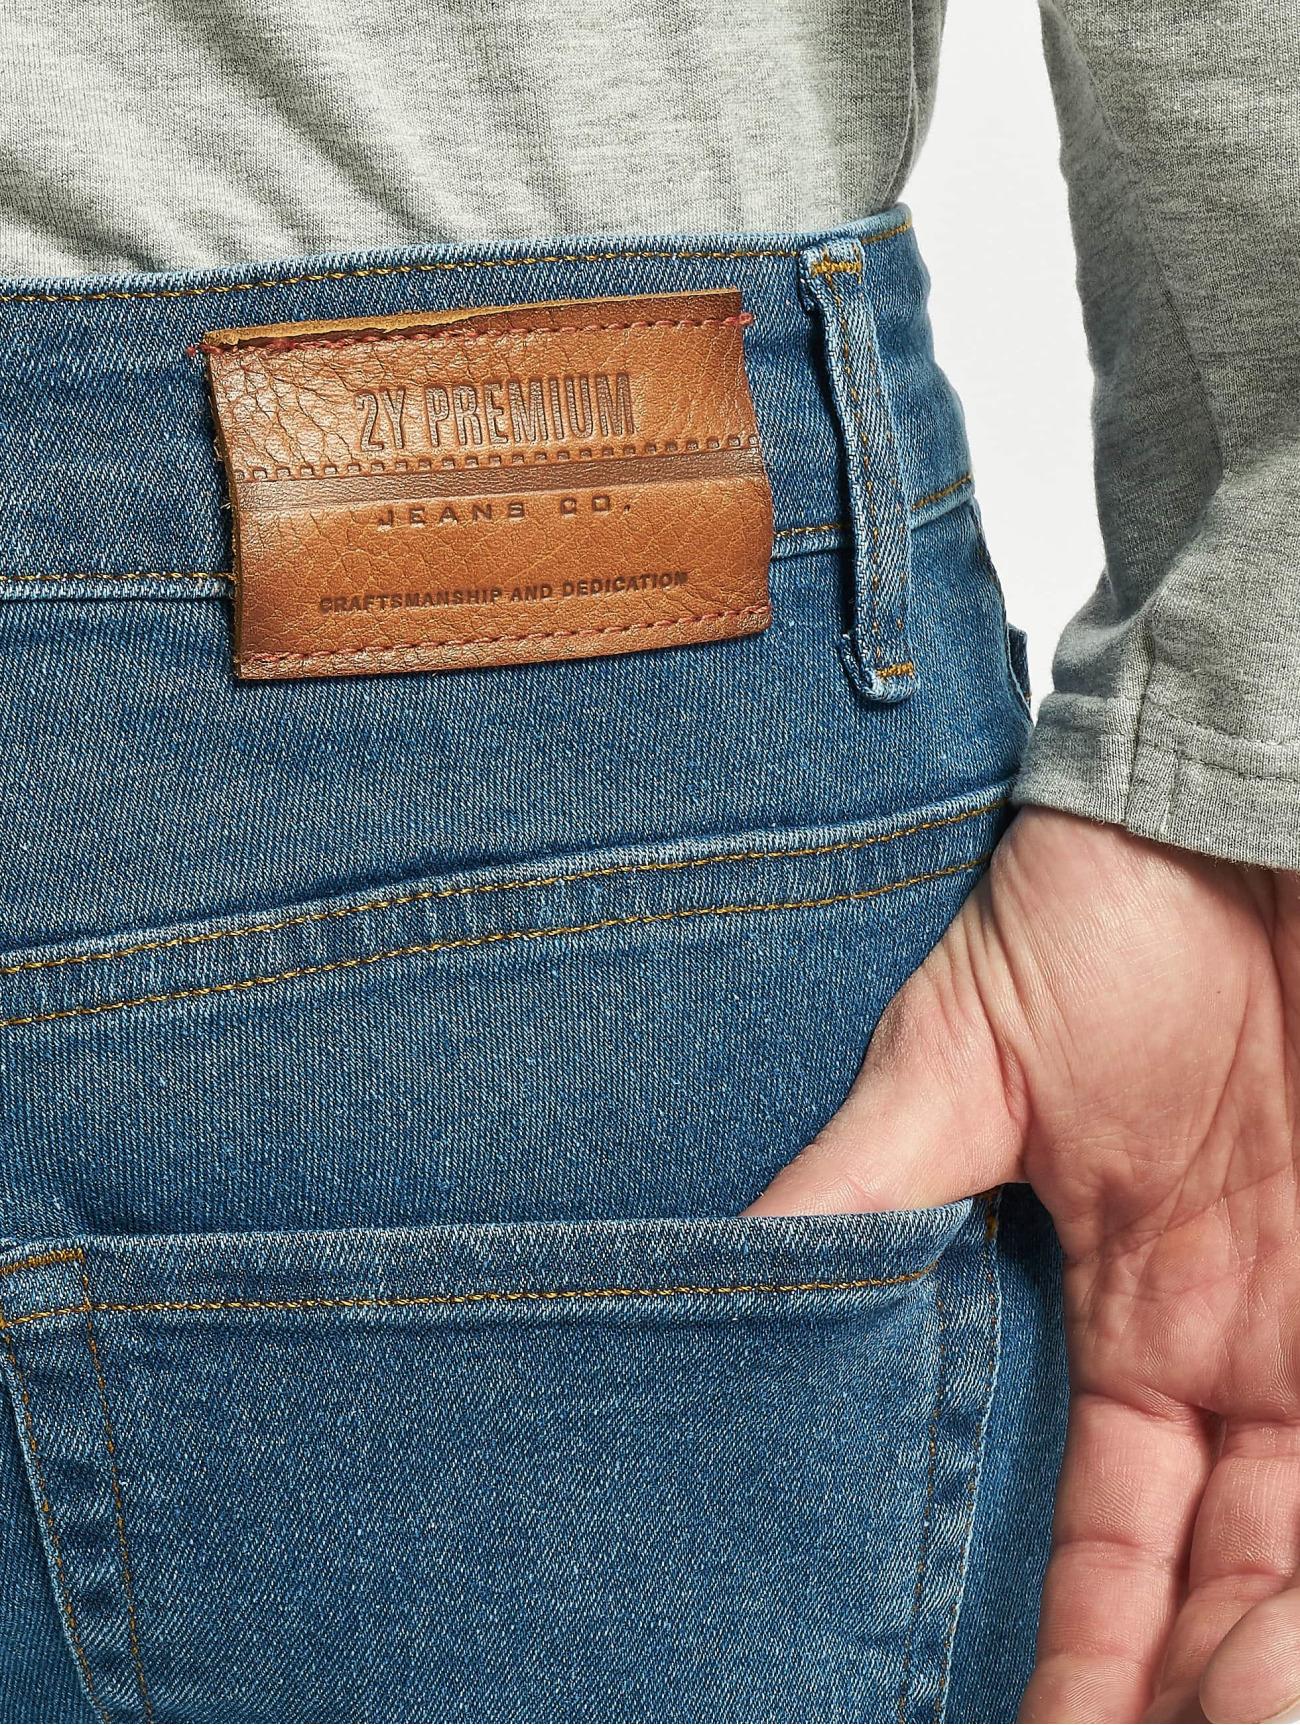 2Y Jeans / Slim Fit Jeans Malik  i blå 746639 Män Jeans